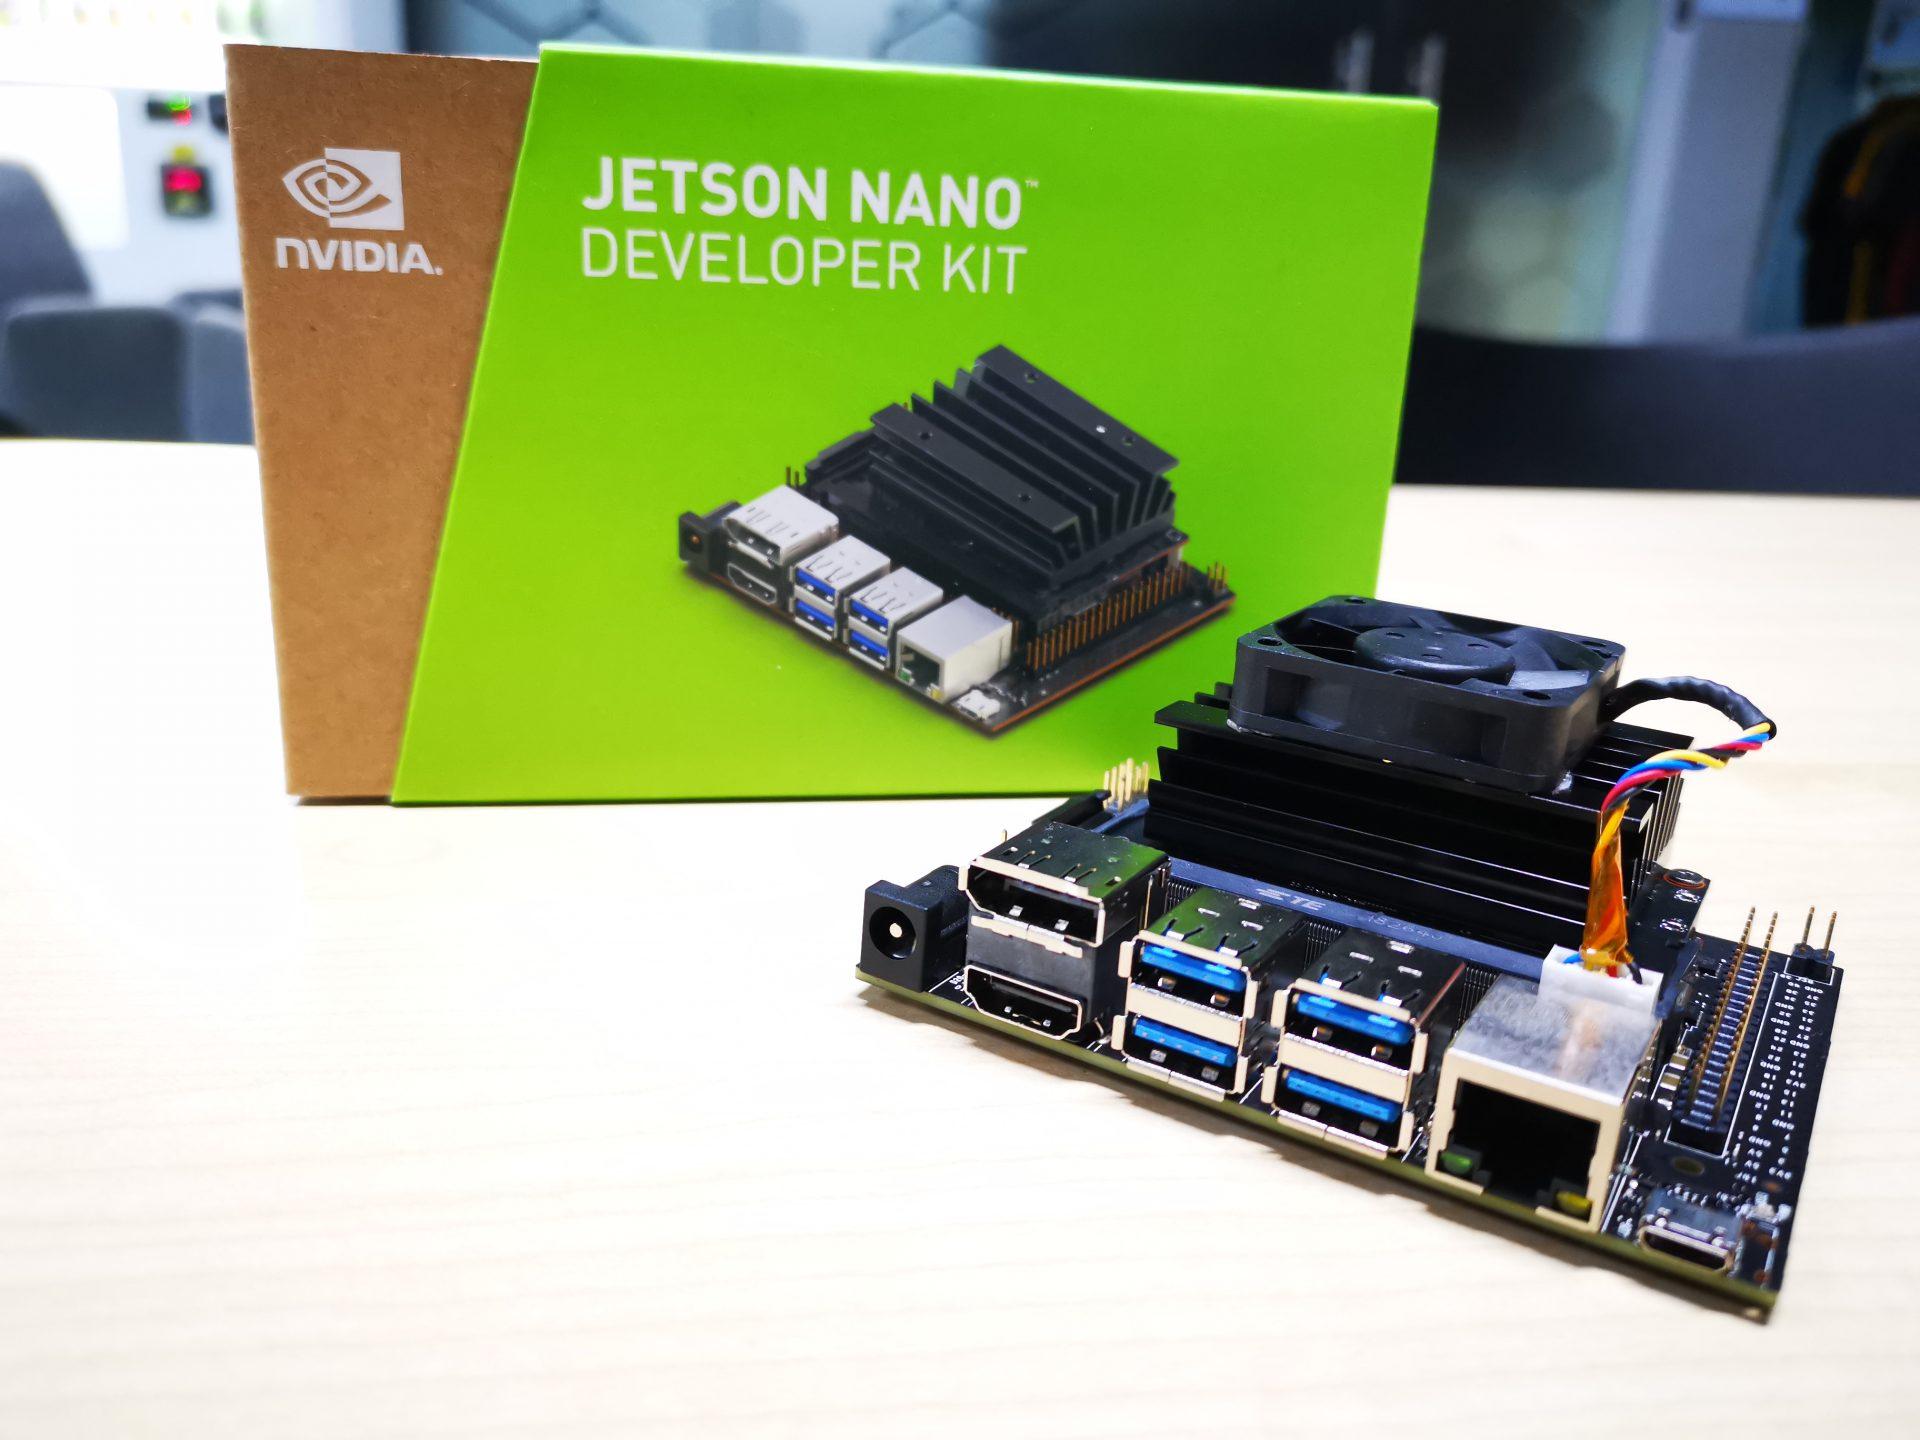 NVIDIA Jetson Nano Developer Kit Review - Introduction [Part 1